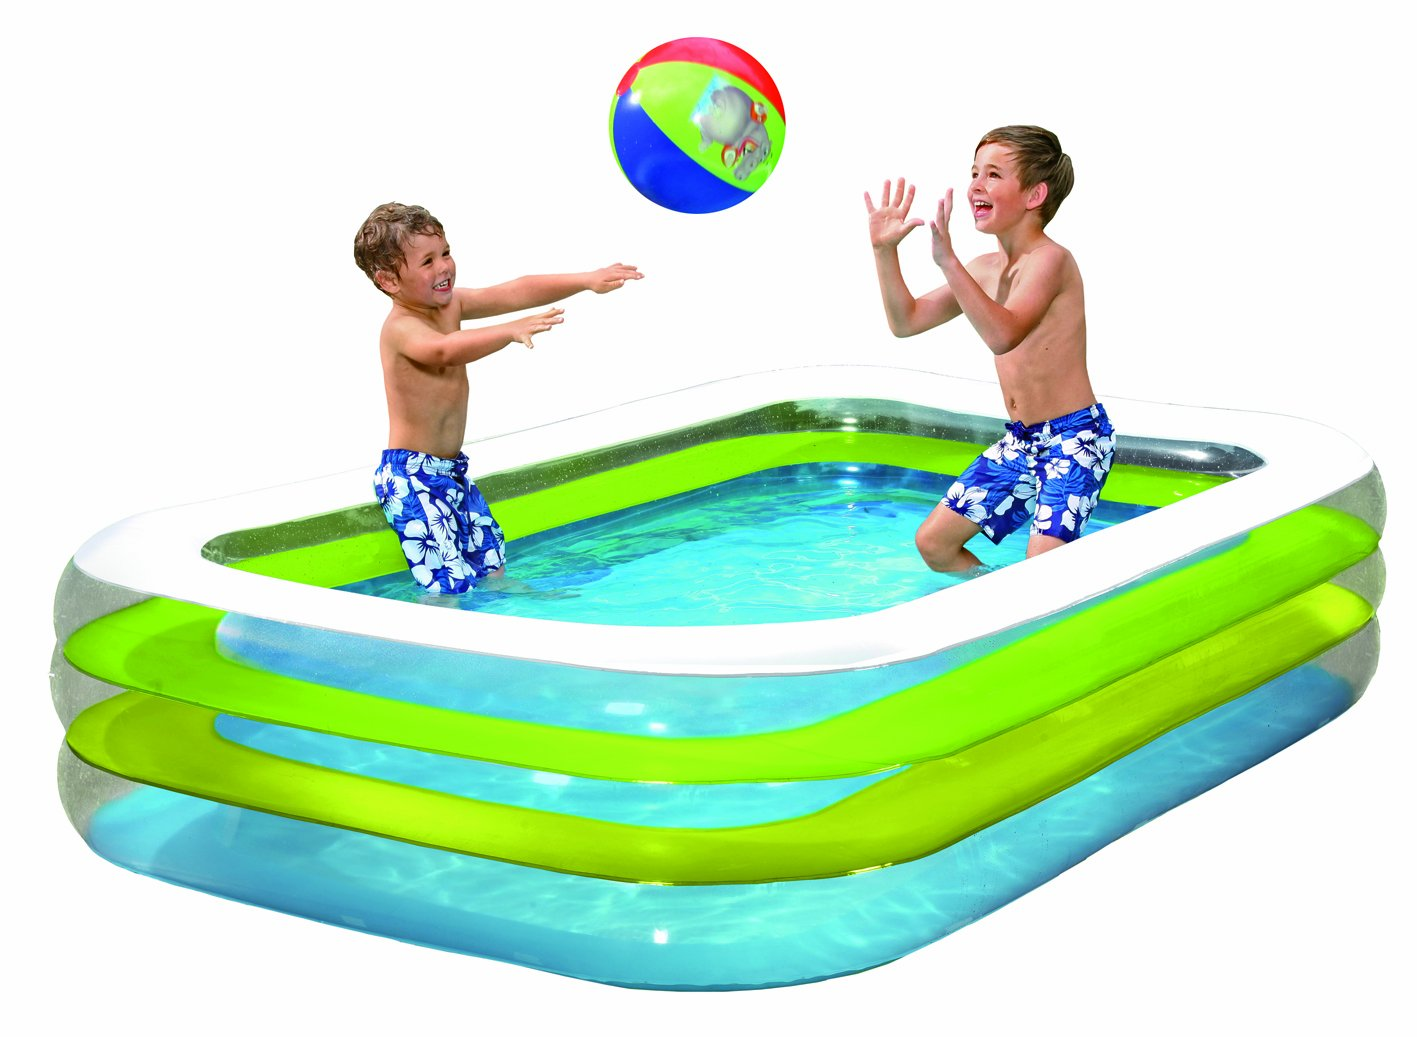 Swimmingpool aufblasbar rechteckig  Wehncke 12240 Jumbo Pool 262 x 175 x 56 cm, transparent: Amazon.de ...